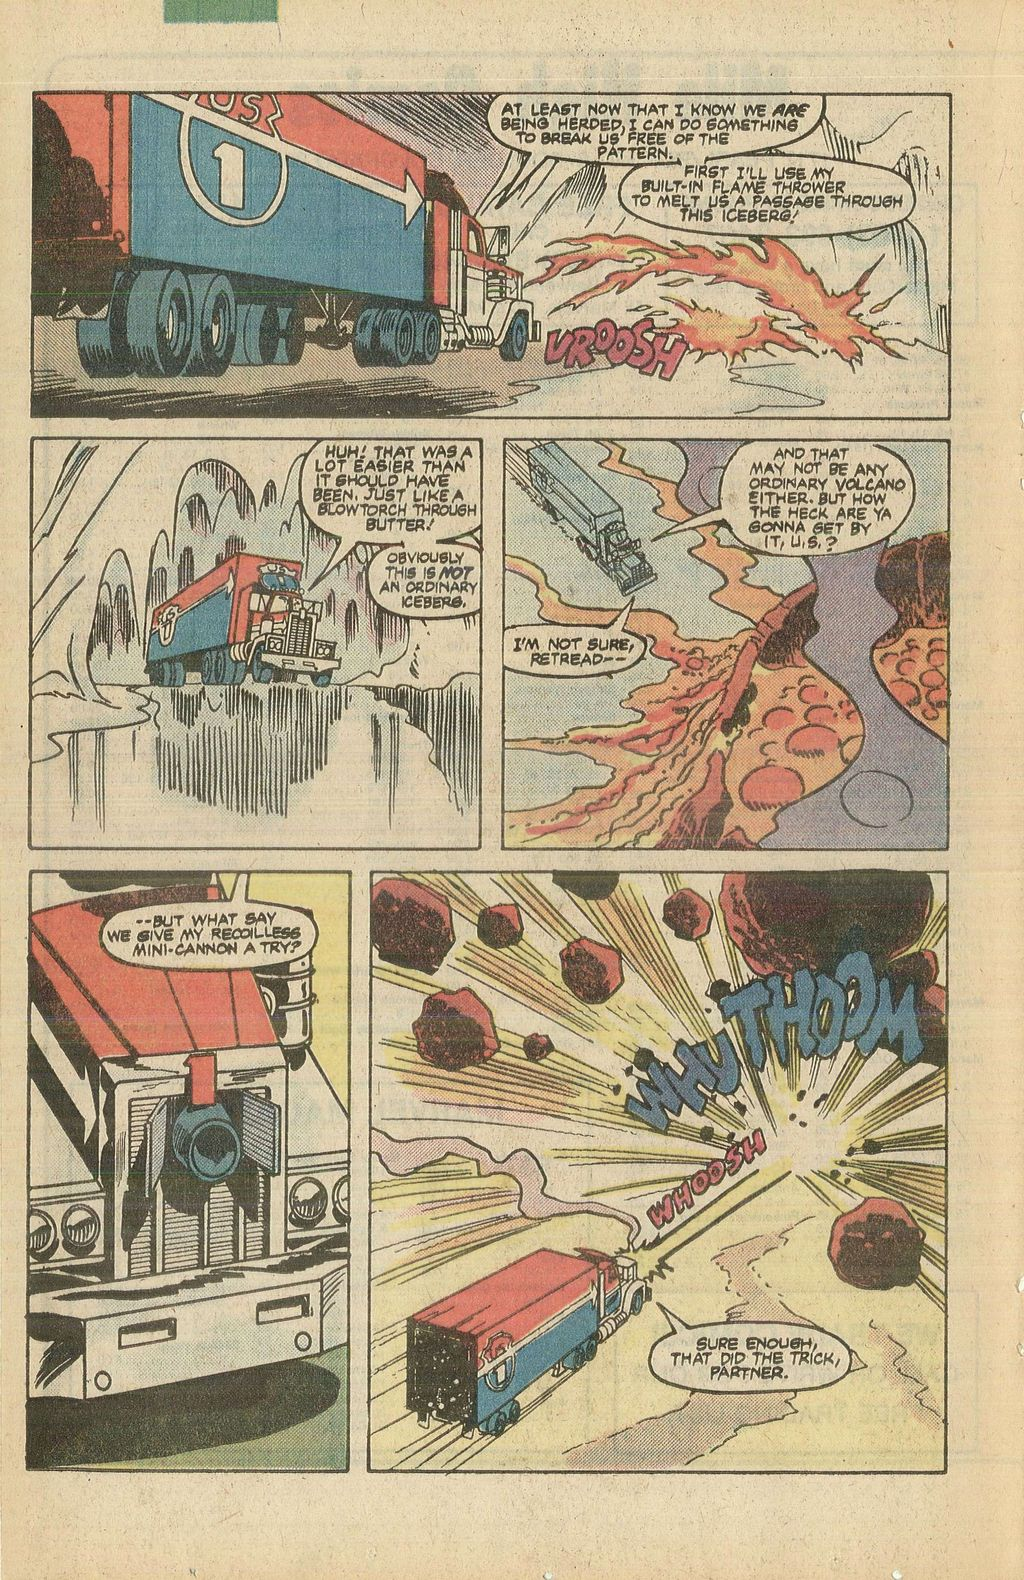 Read online U.S. 1 comic -  Issue #5 - 20